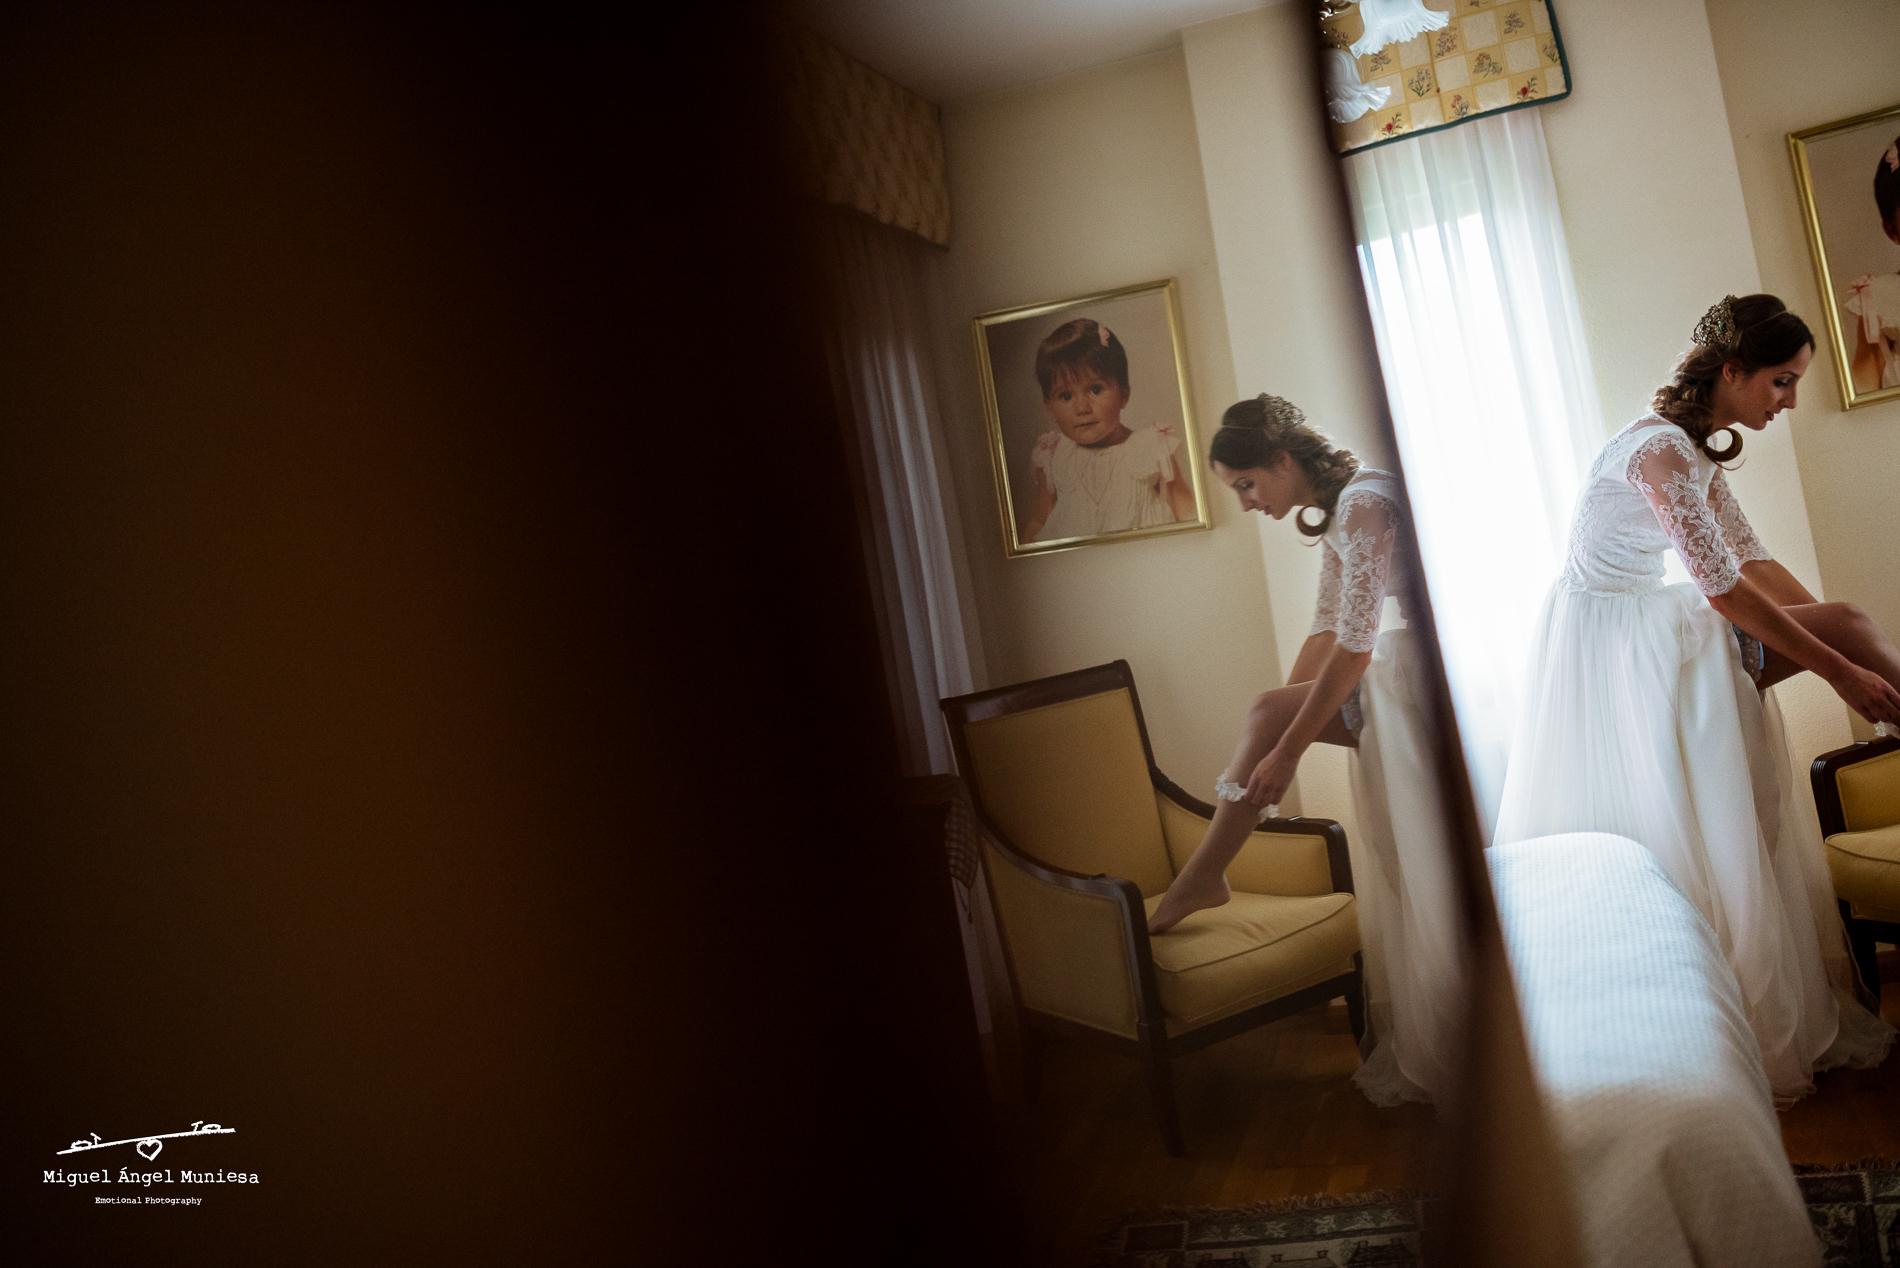 miguel angel muniesa, fotografo boda Teruel, fotografo boda navarra, fotografo boda zaragoza, fotografo boda soria, miguel angel muniesa emotional photography_09